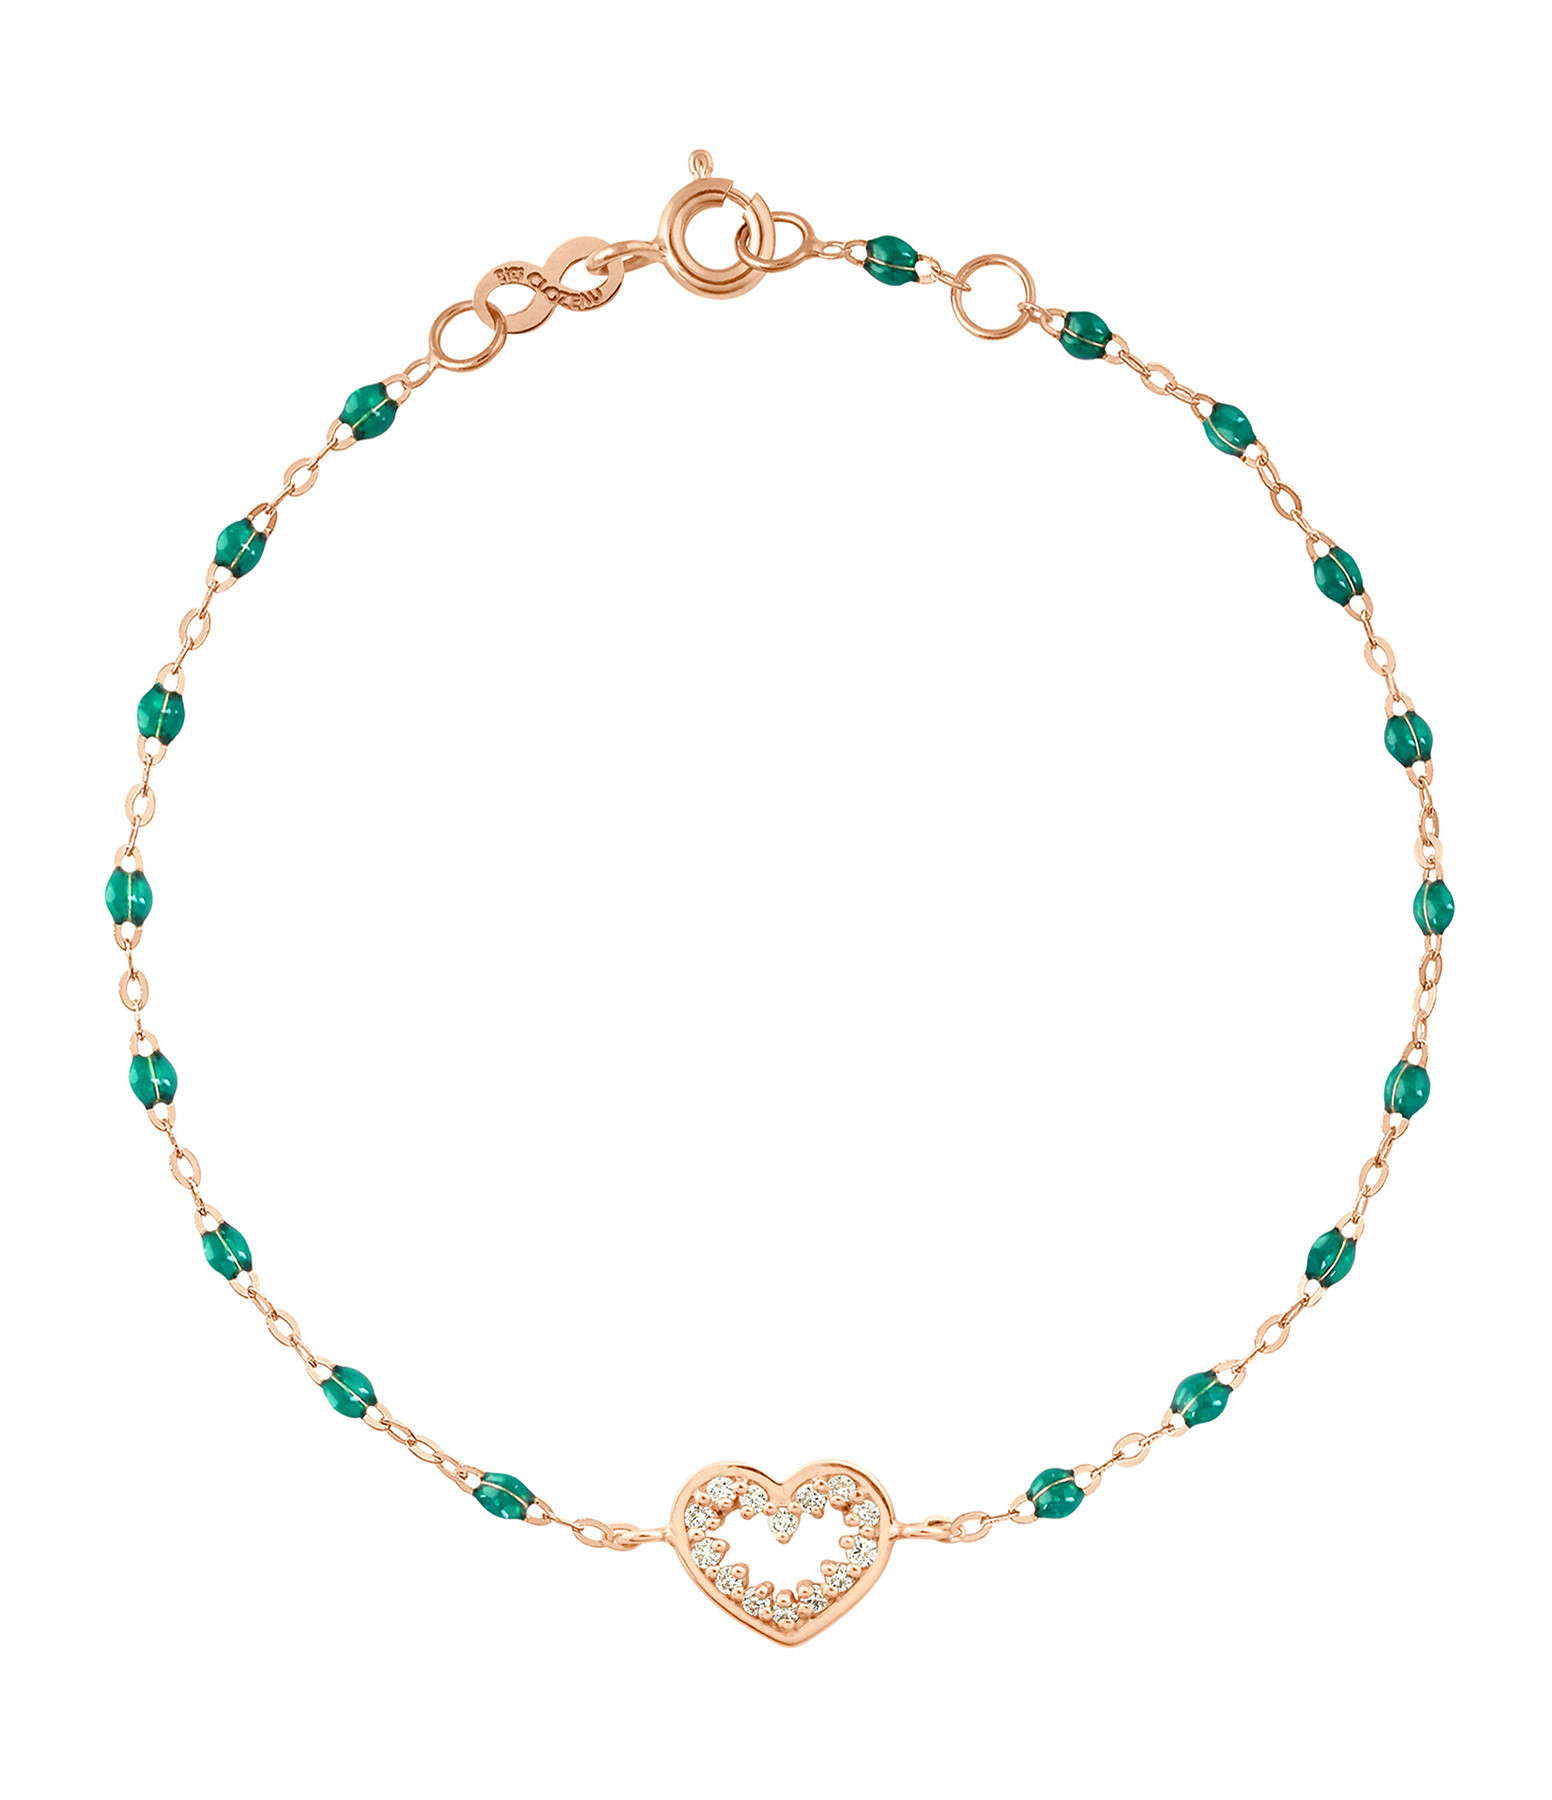 GIGI CLOZEAU - Bracelet Résine CŒur Suprême Diams OR